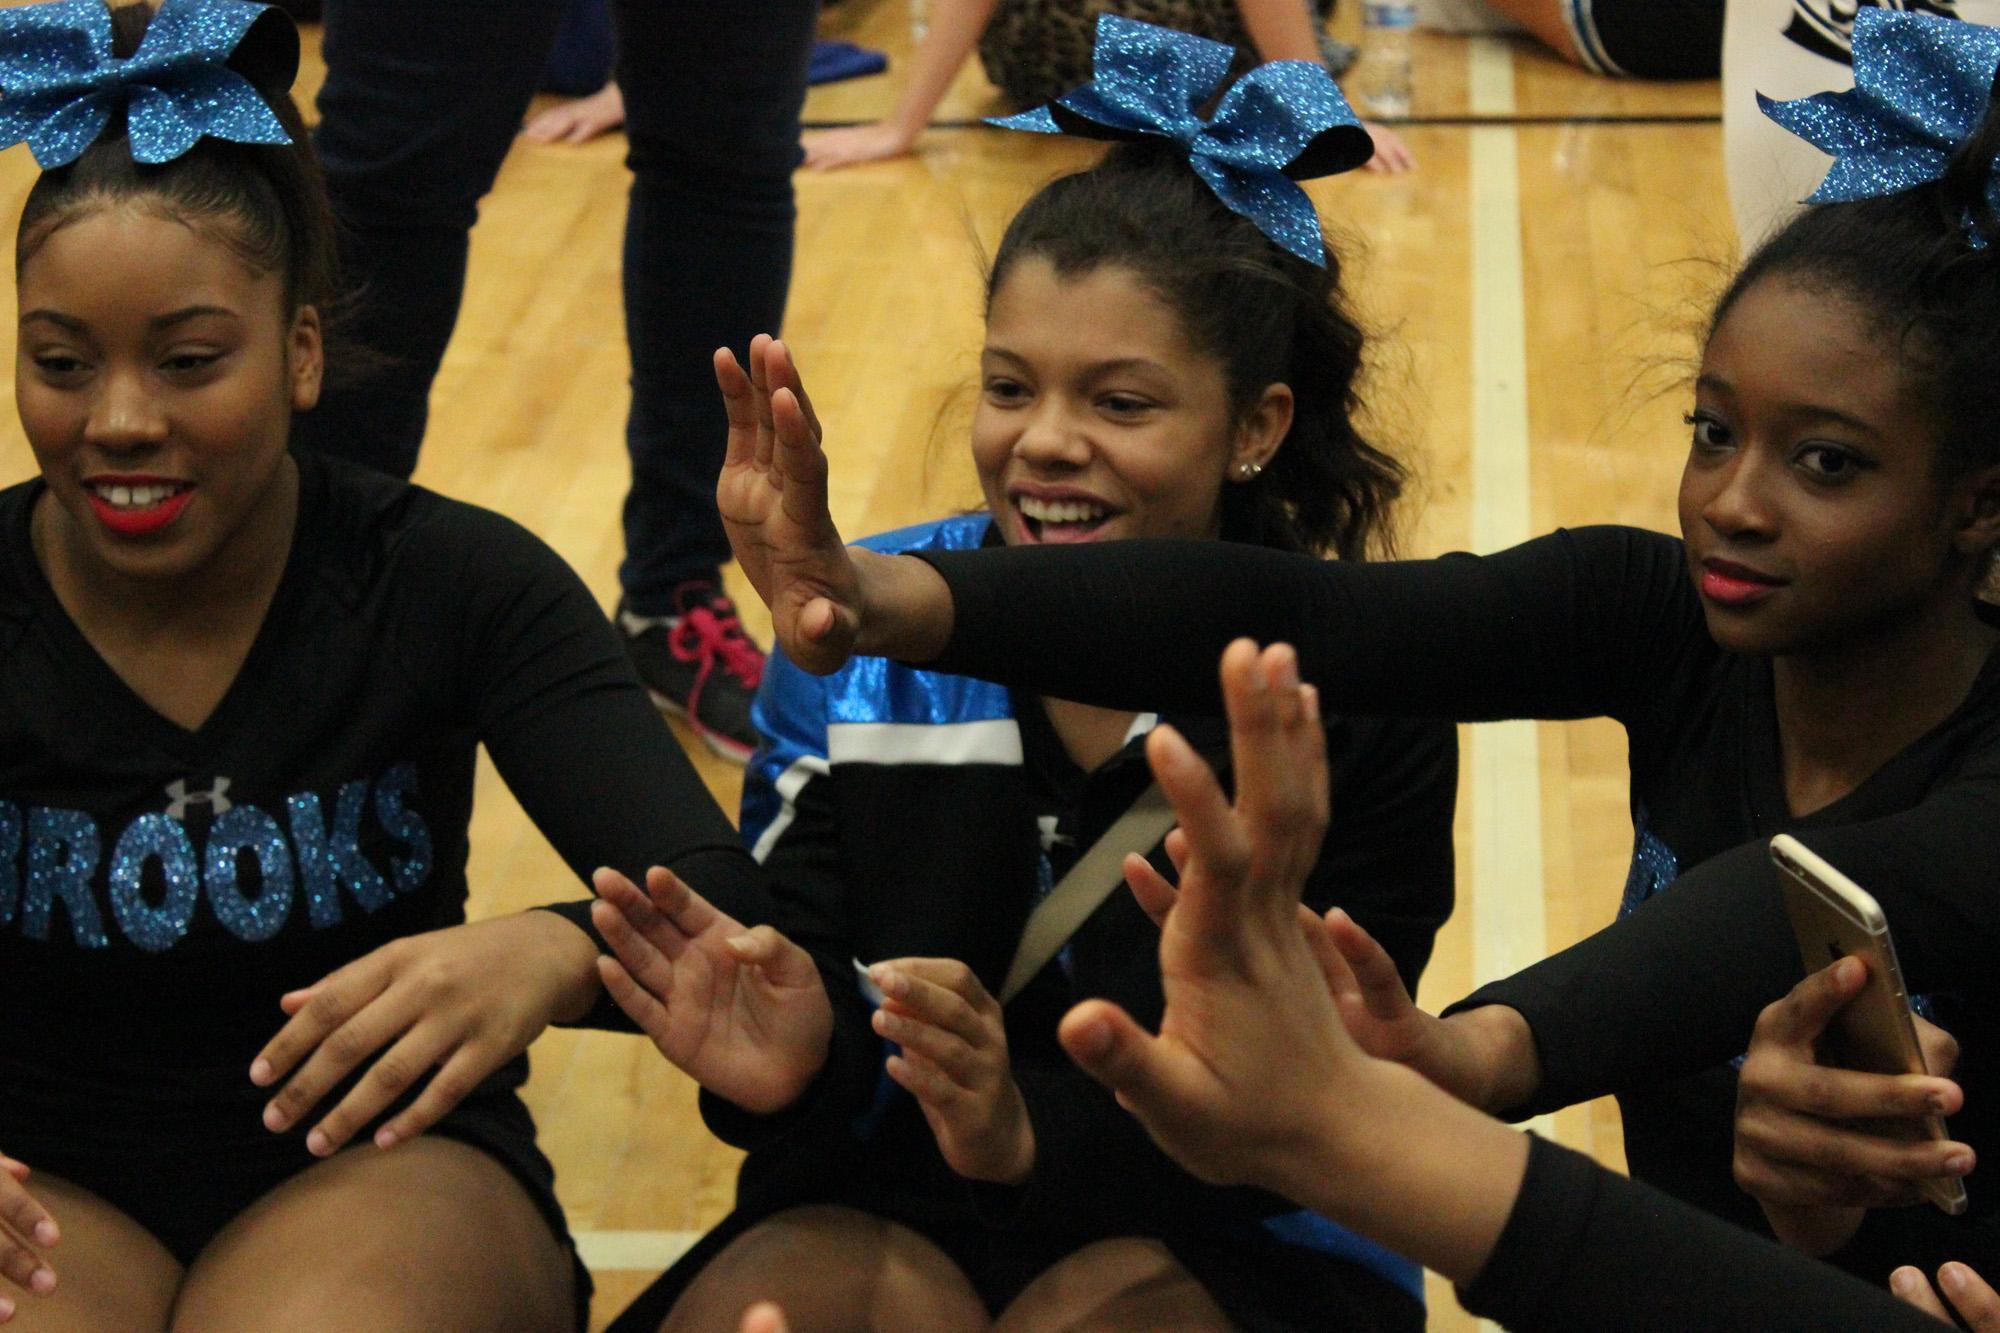 Mia Roberts (center) at the ICCA Cheerleading Invitationals